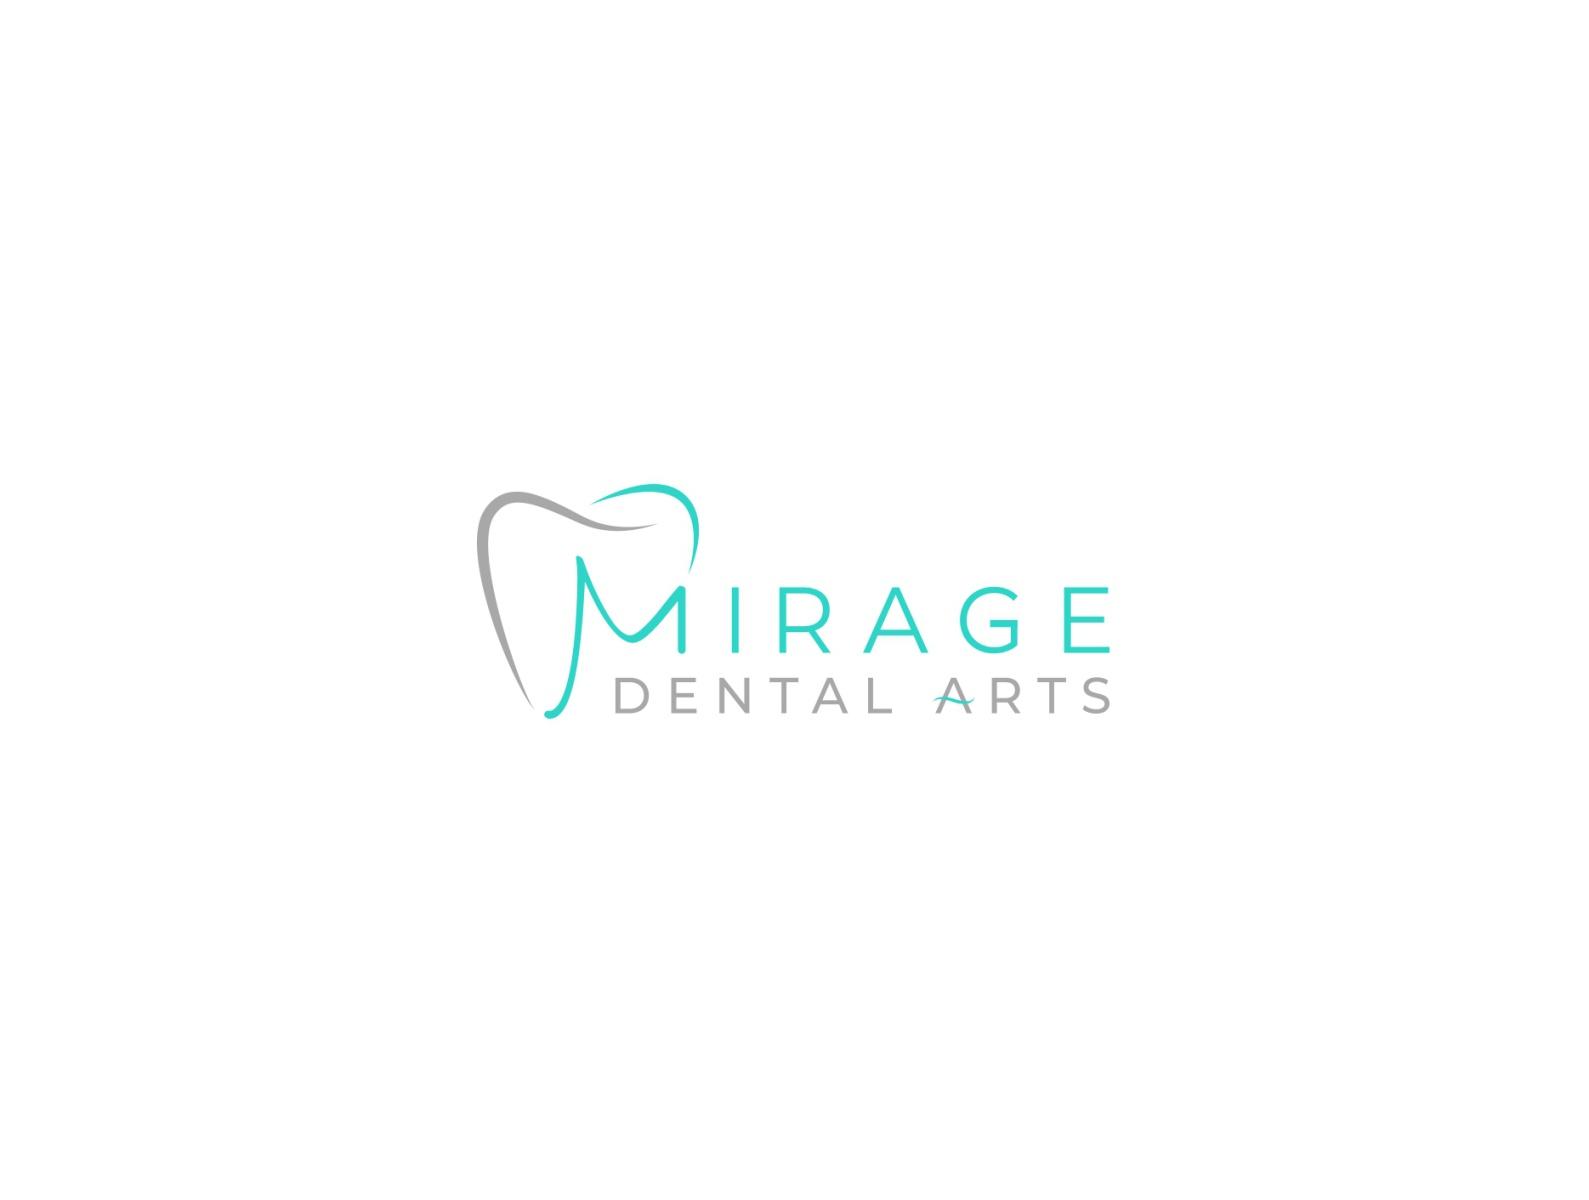 Mirage Dental Arts